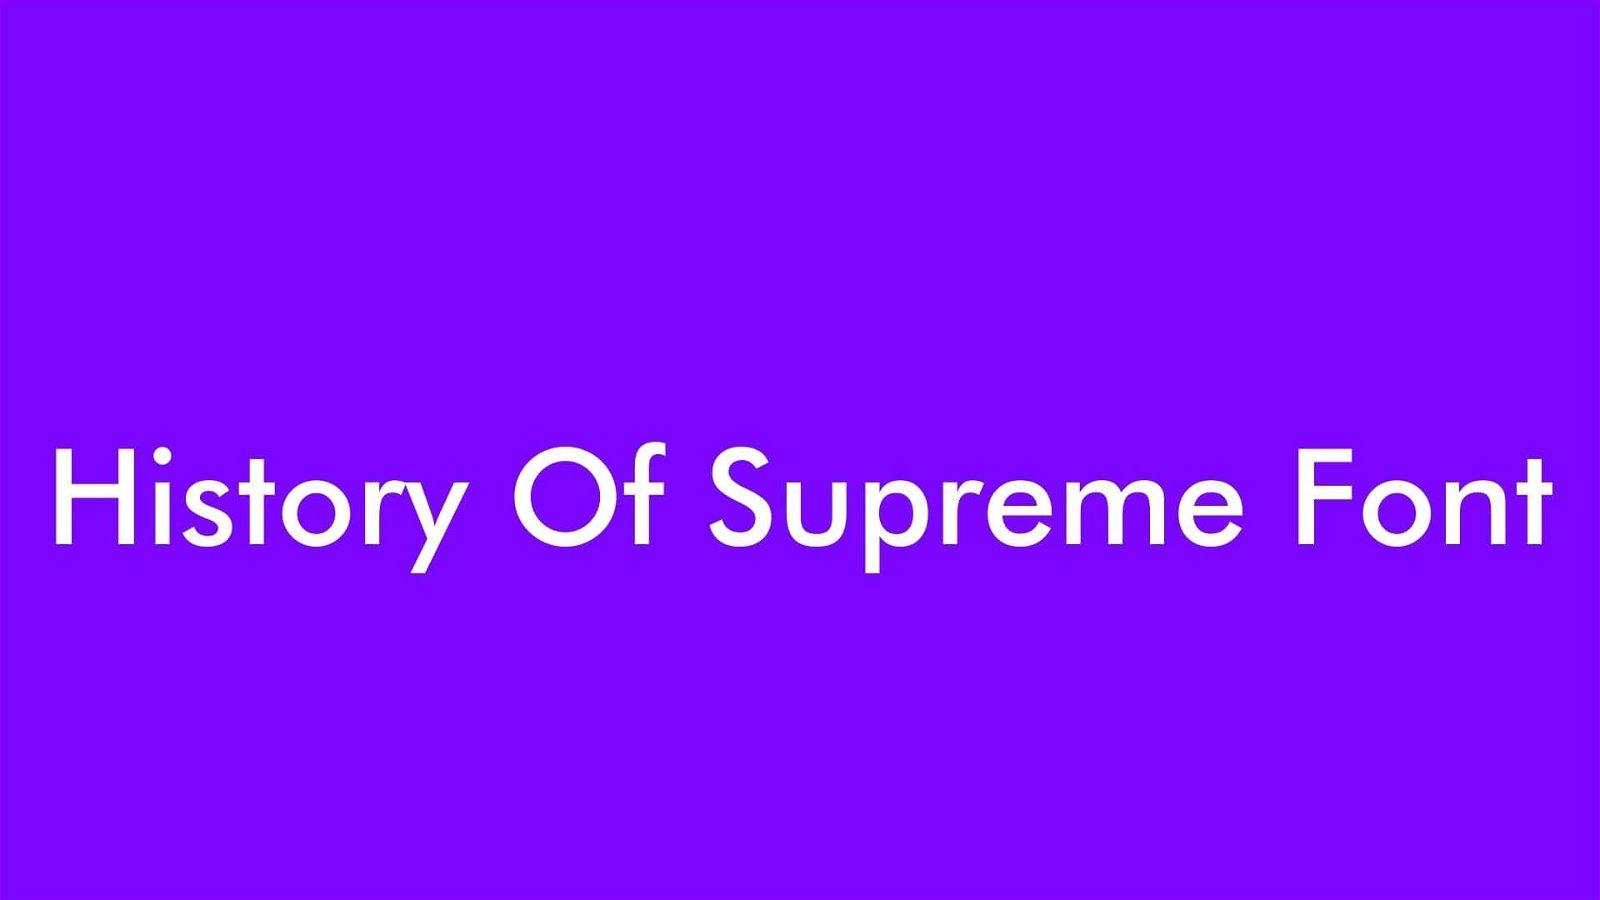 History Of Supreme Font